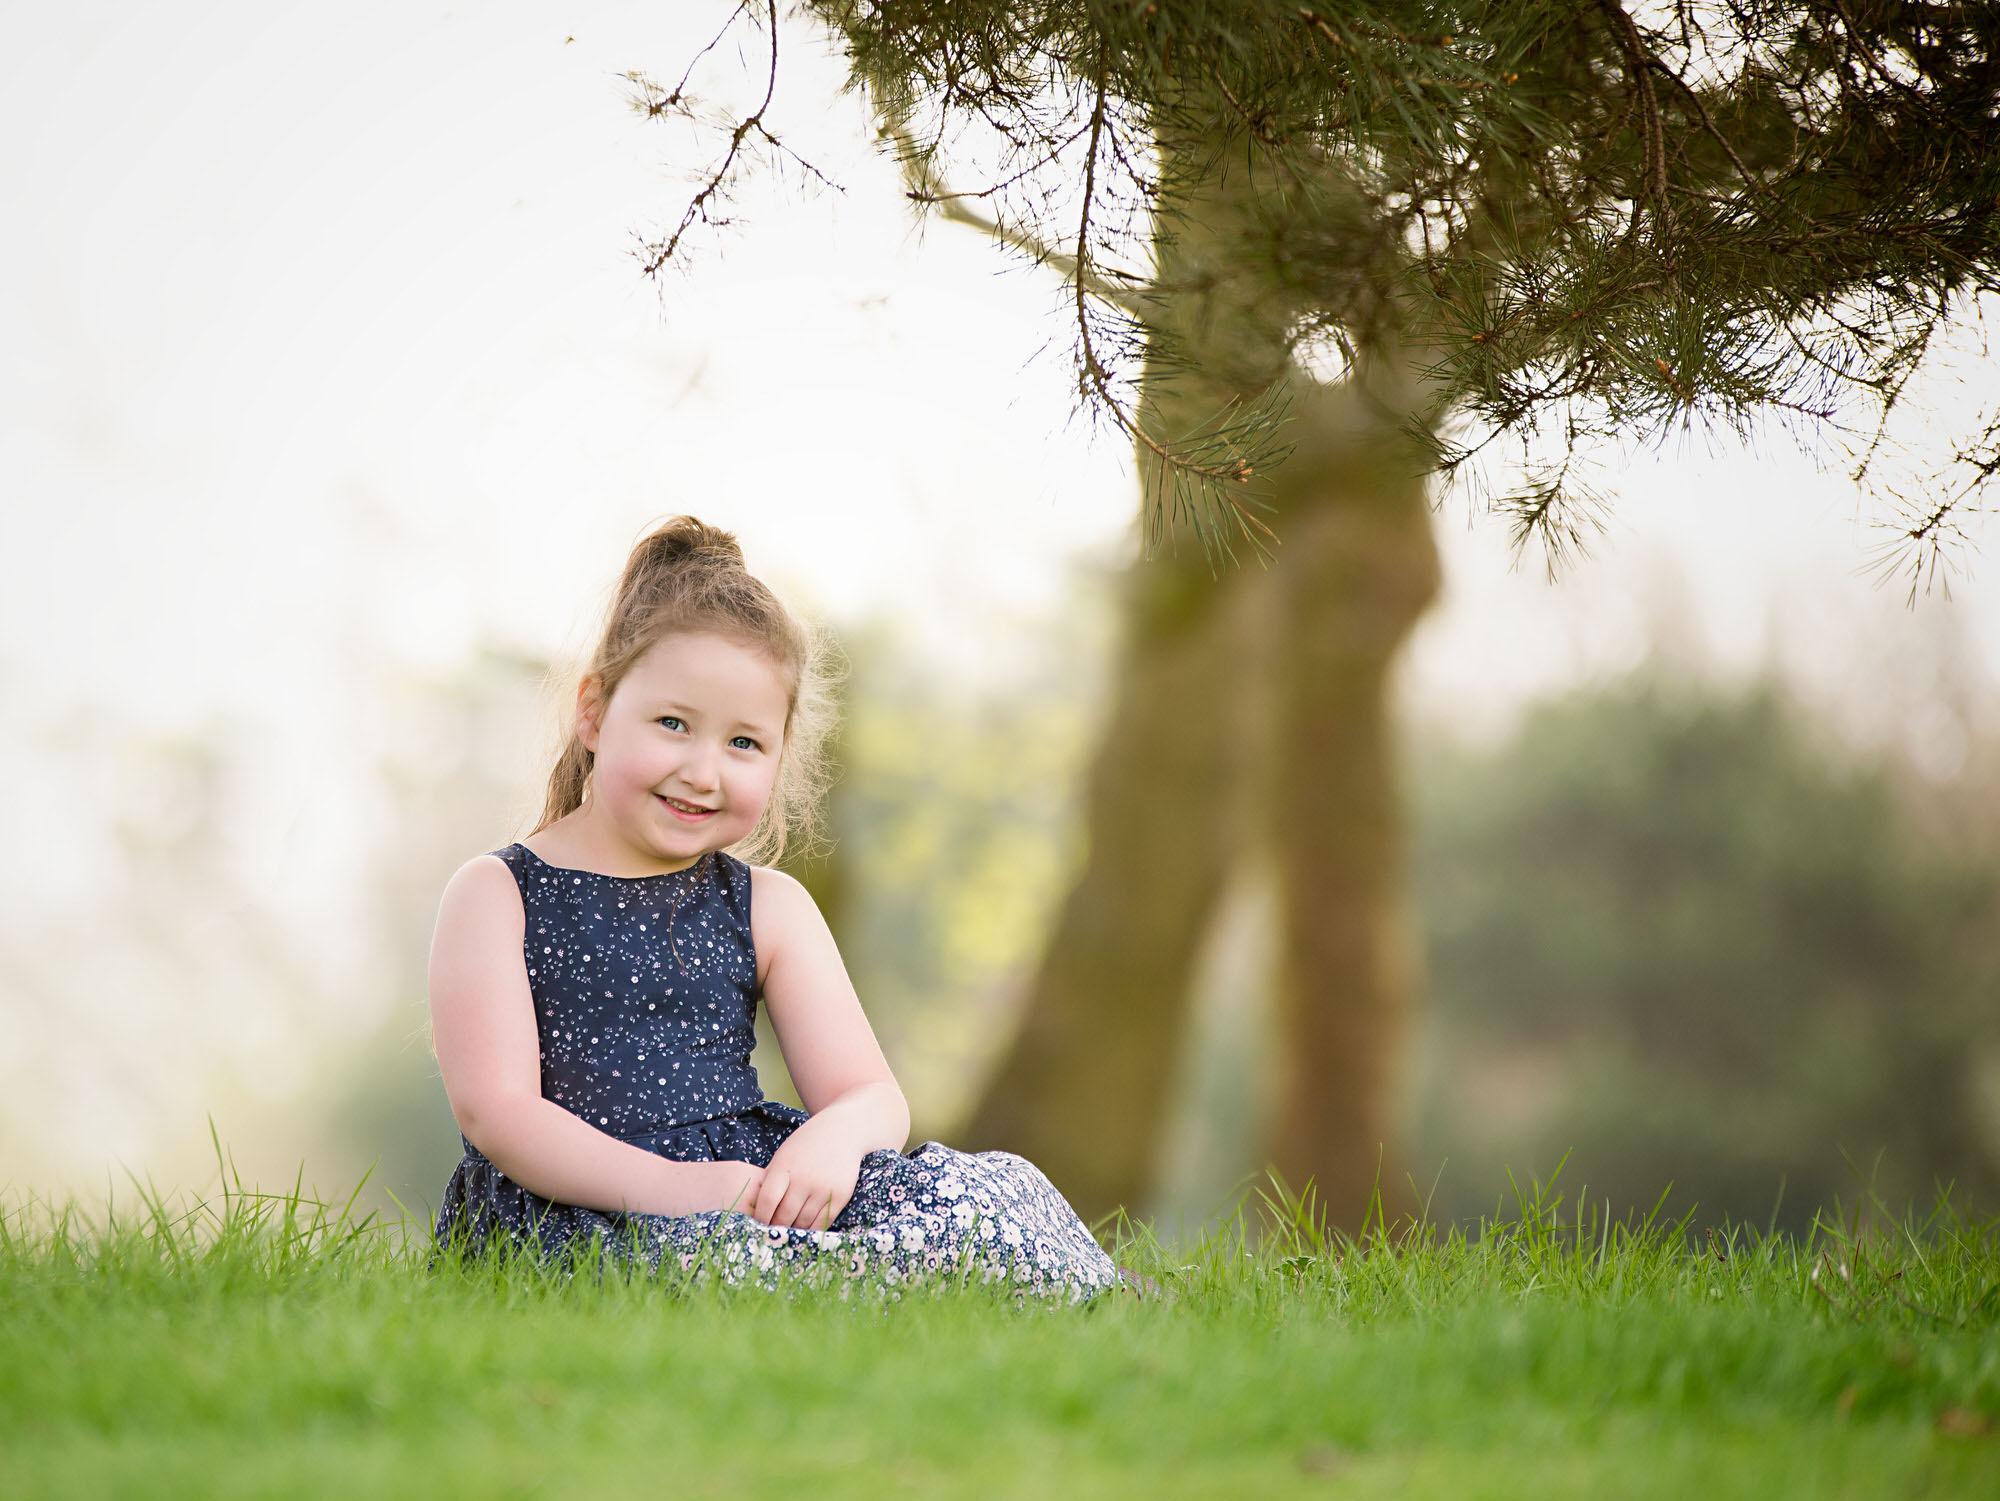 children photographer in Barnsley, outdoor spring shoot